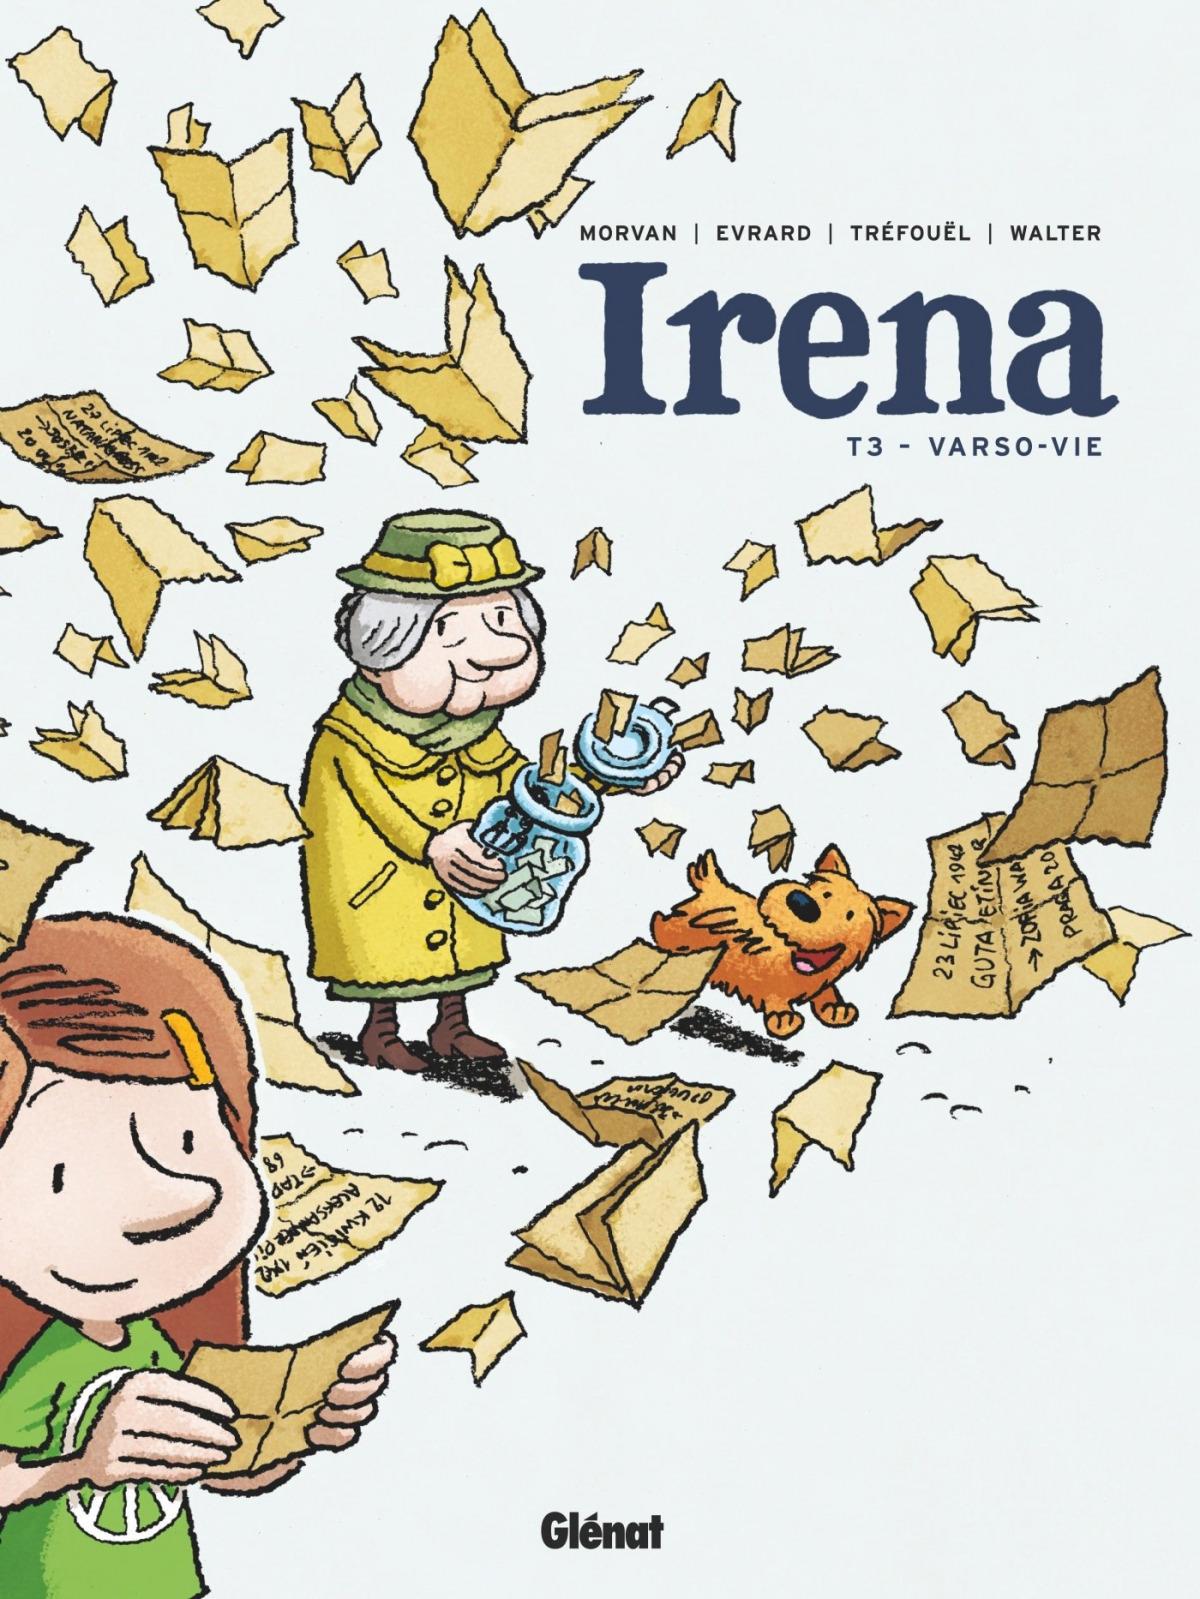 3.IRENA VARSO-VIE